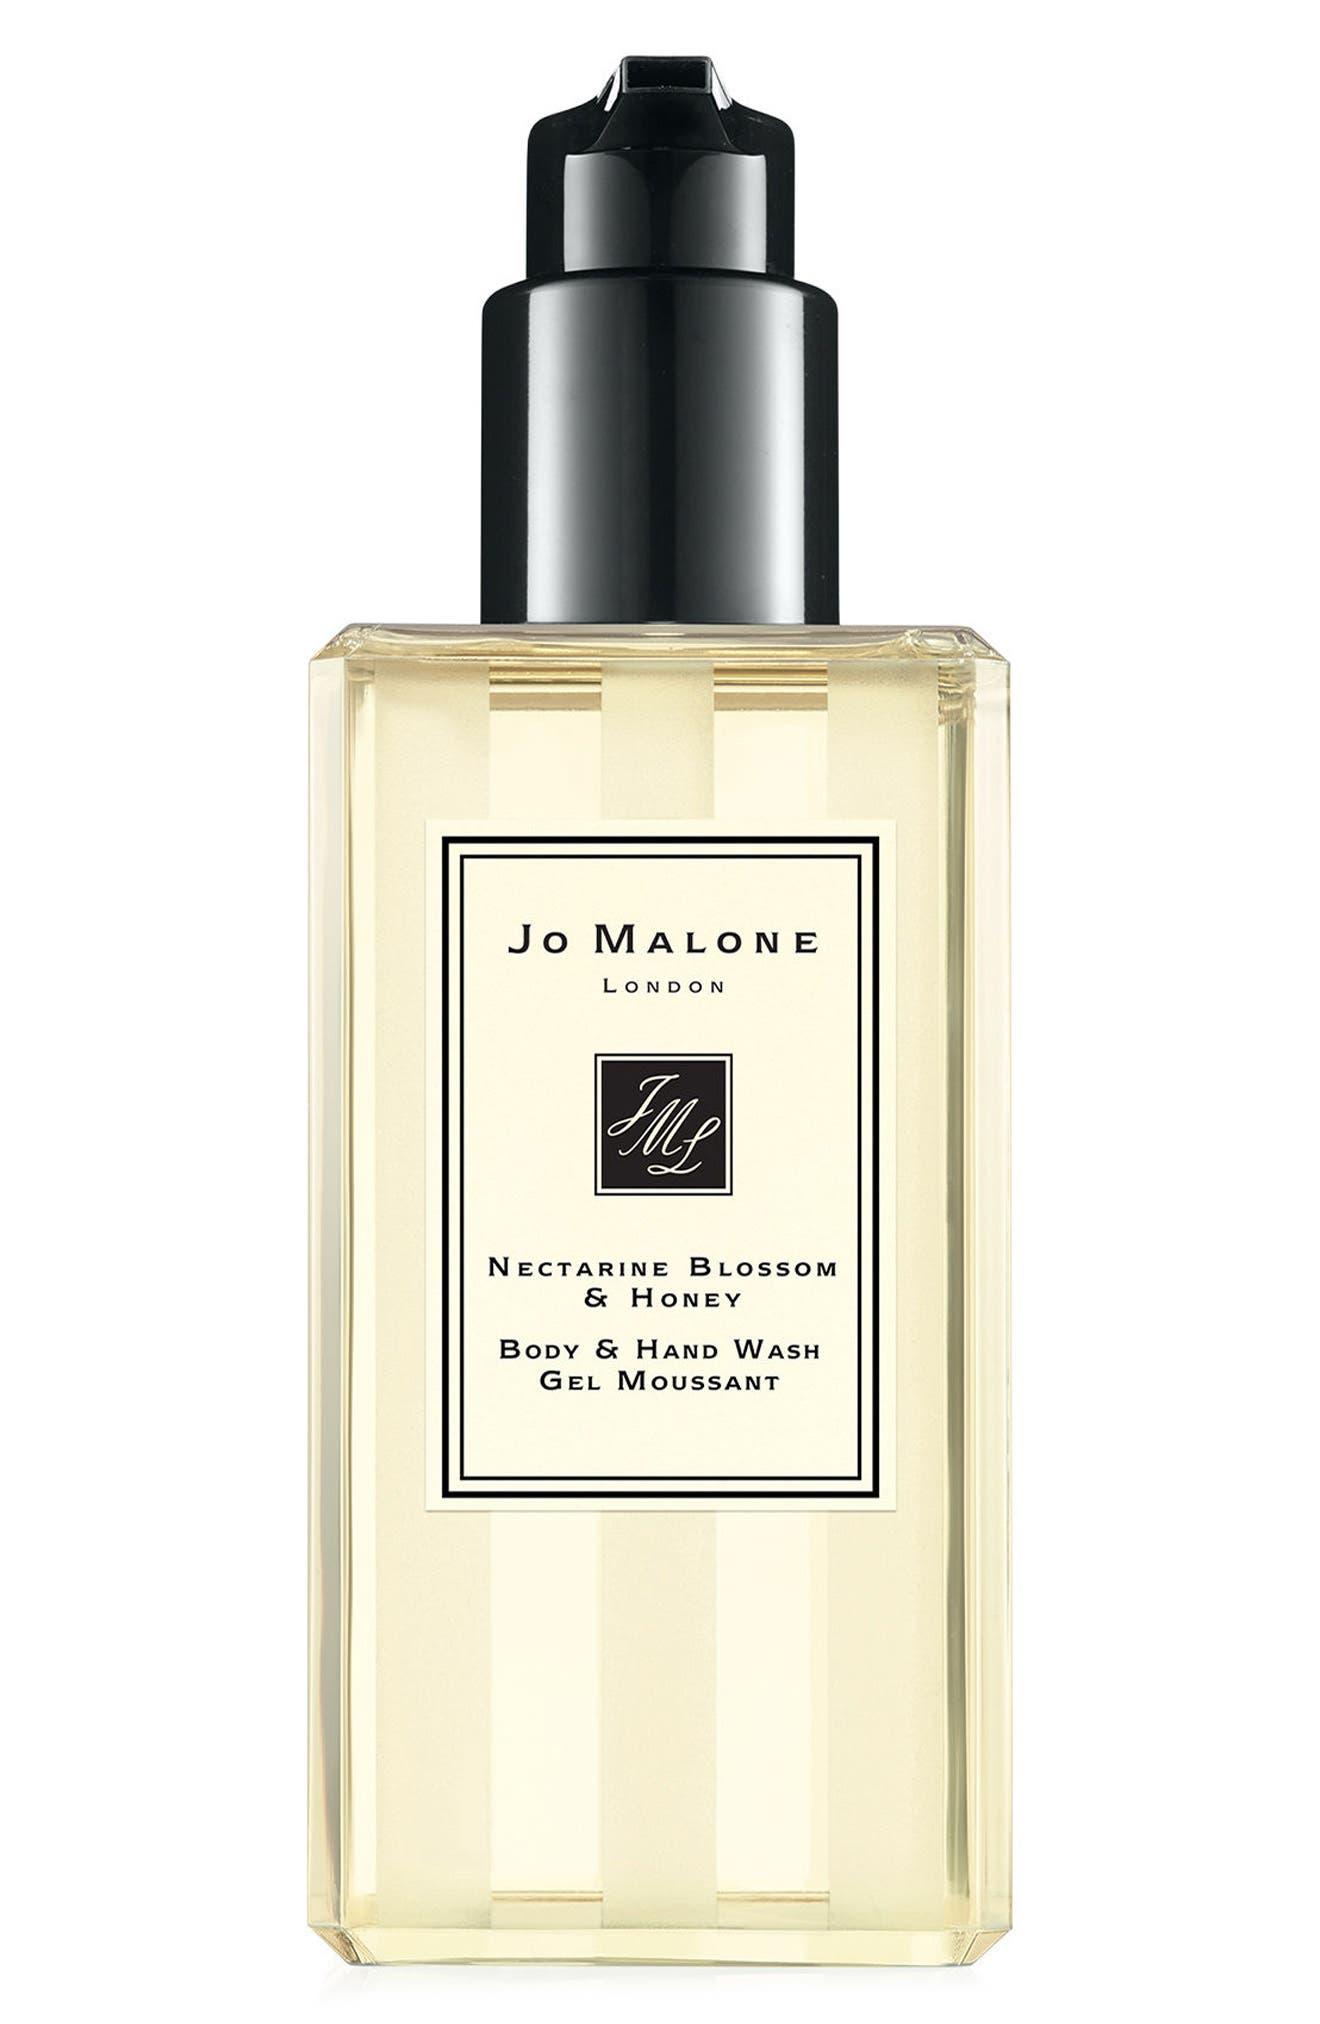 Jo Malone London™ Nectarine Blossom & Honey Body & Hand Wash